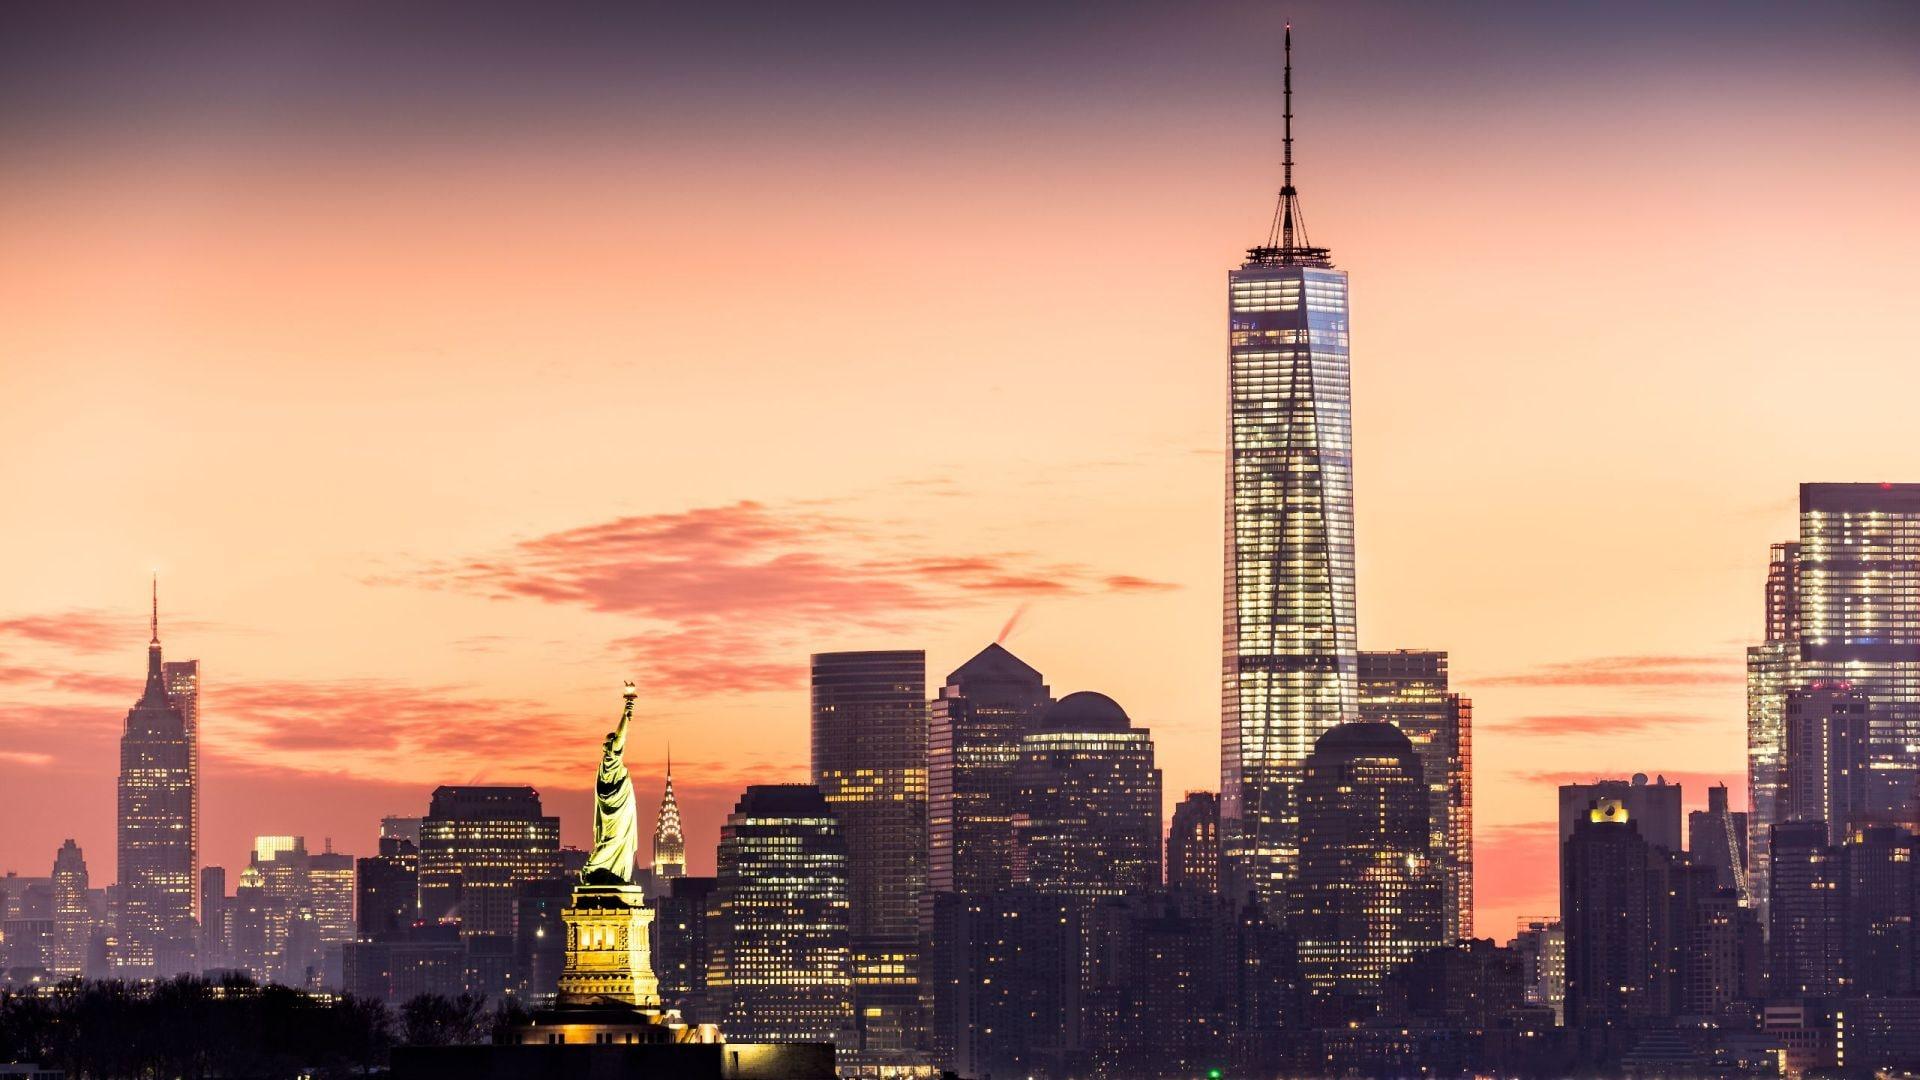 Andaz Lower Manhattan at Sunrise